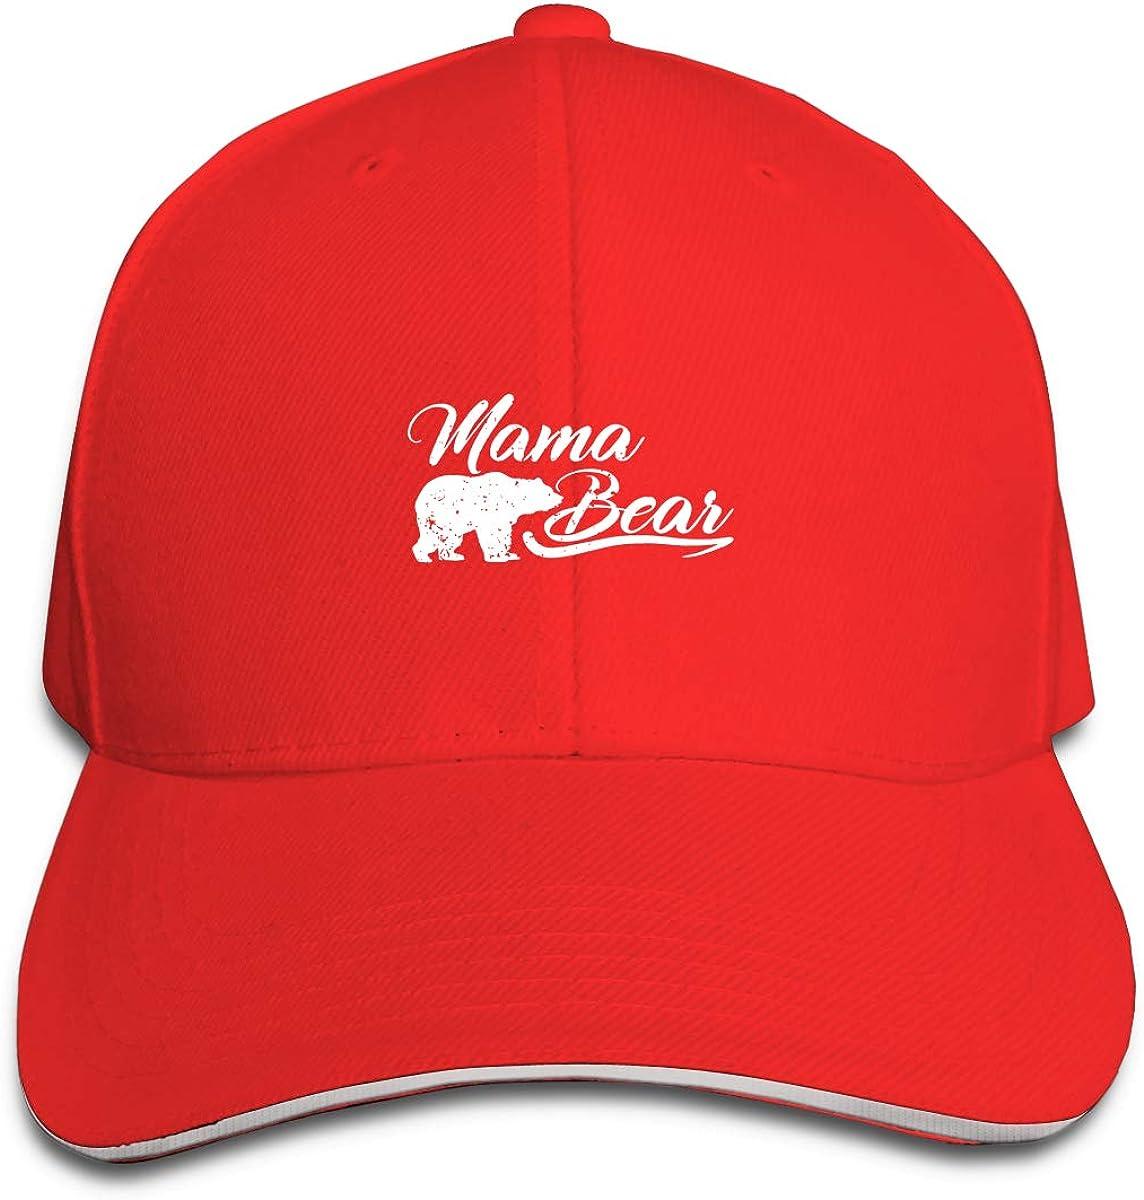 Retro Mama Bear Mom Men and Women Adjustable Sandwich Peaked Baseball Cap